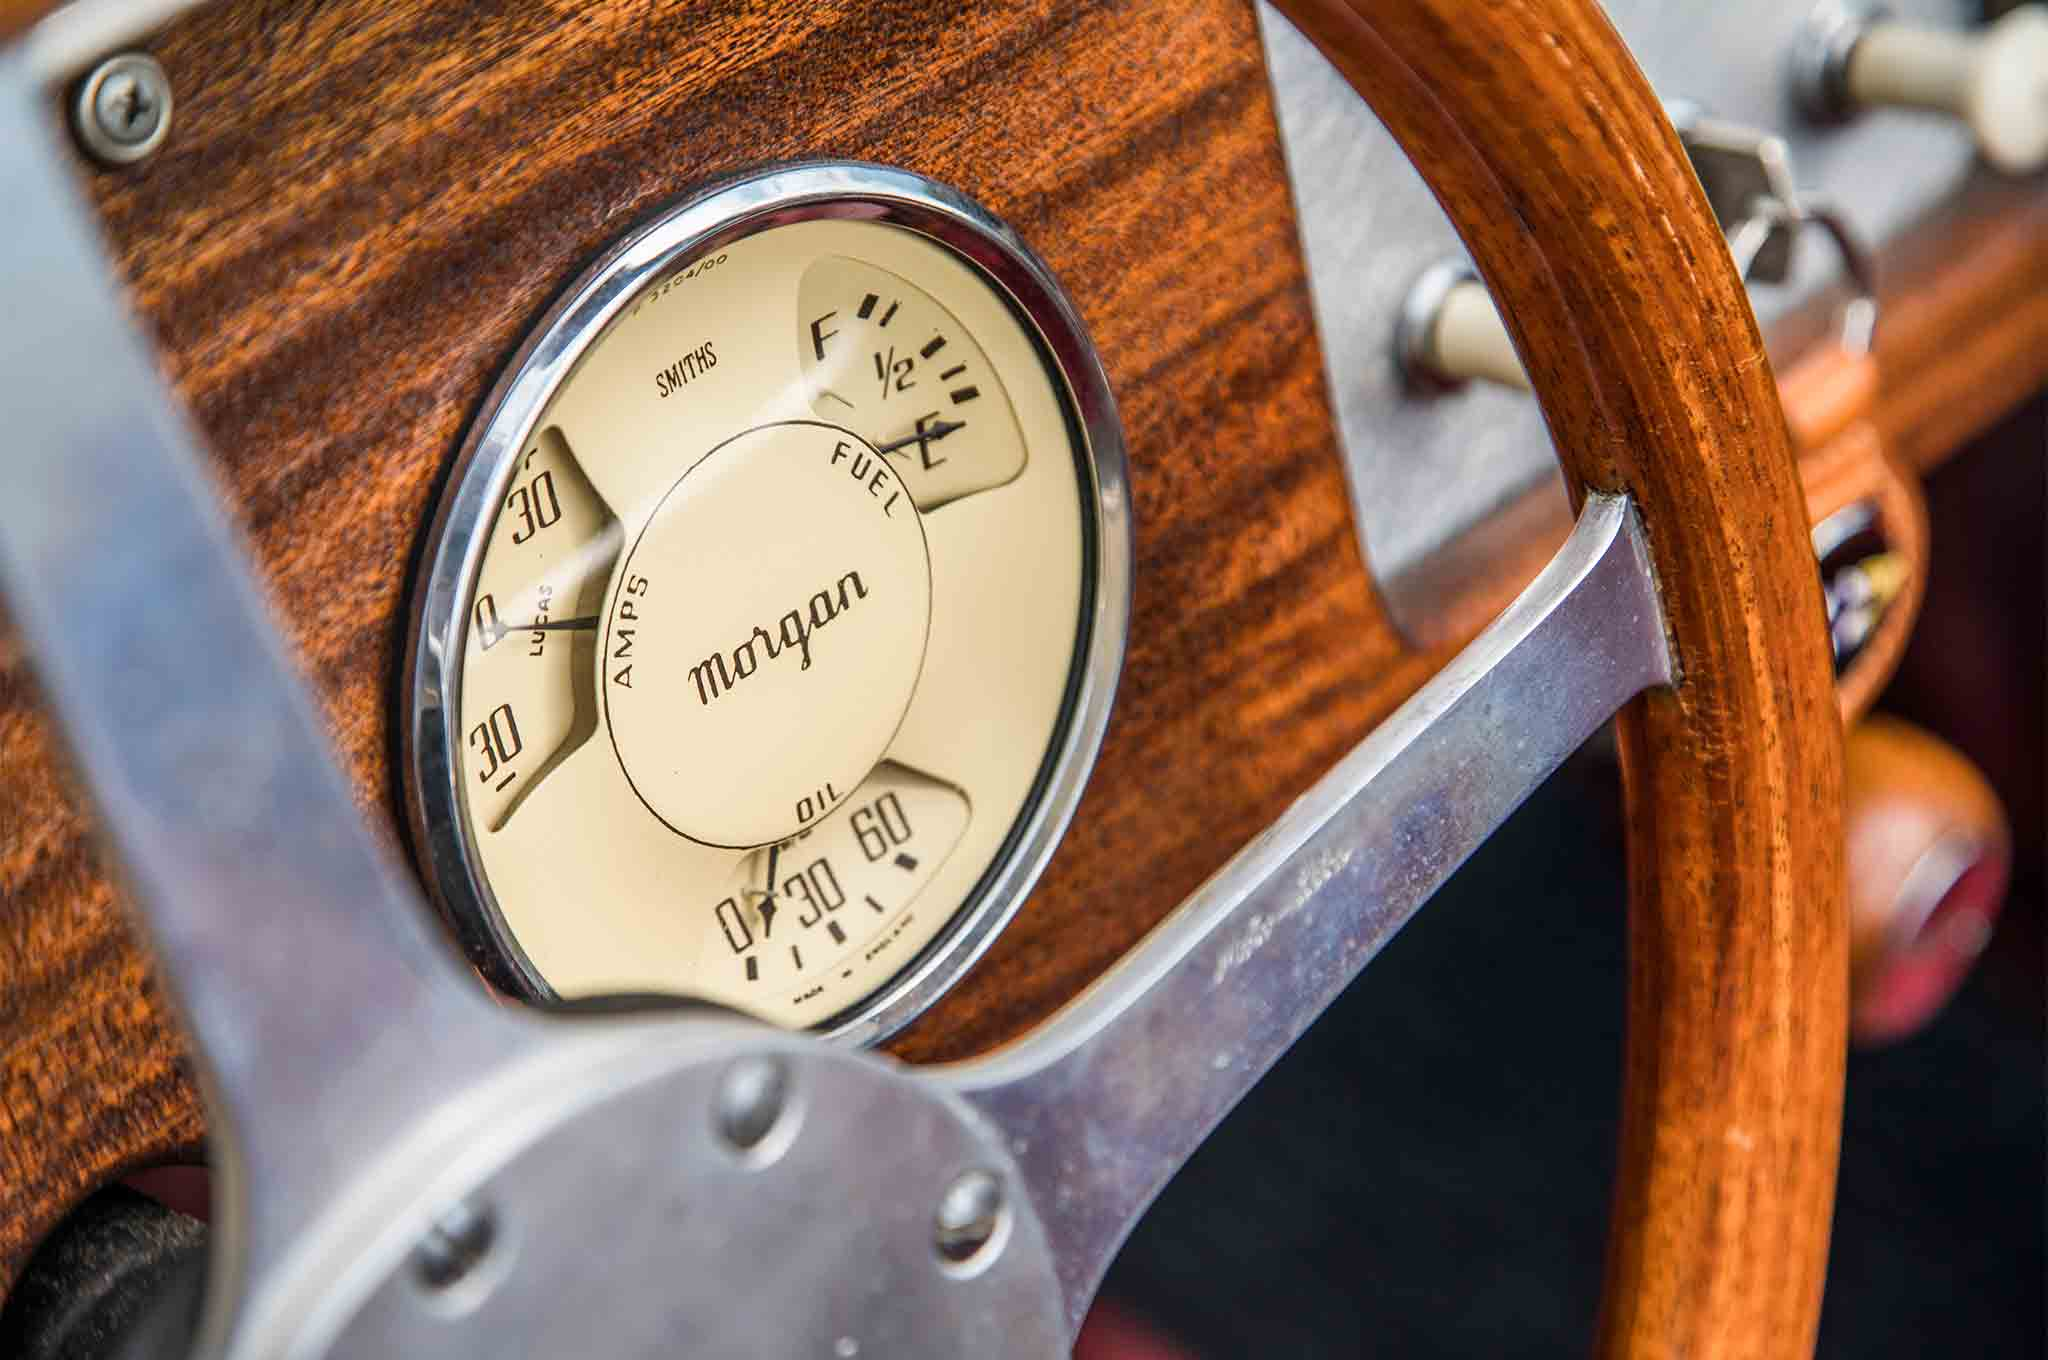 1963 Morgan 4 4 Dashboard Gauge 01